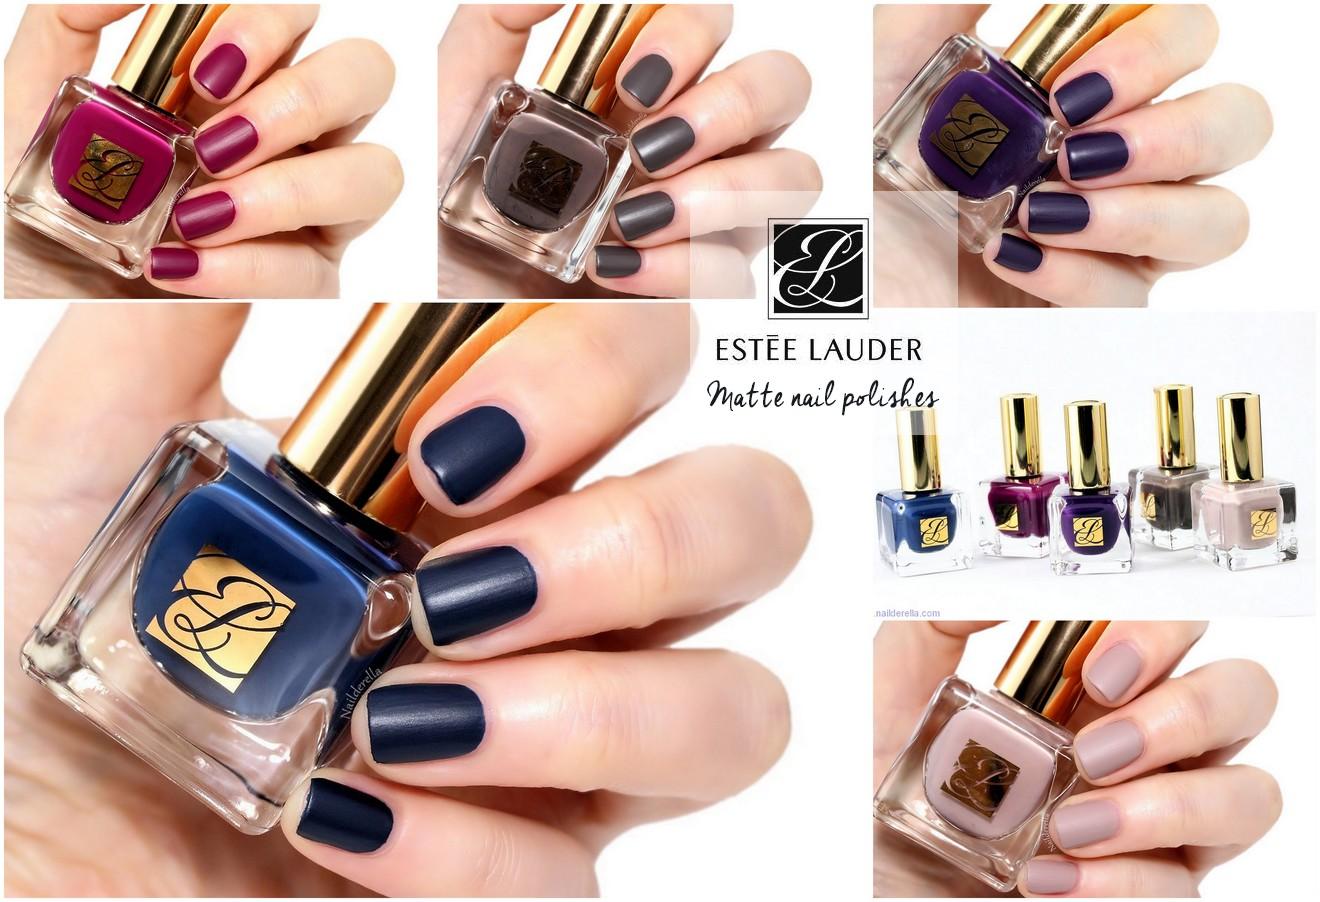 Estée Lauder - Matte nail polishes | Nailderella | Bloglovin\'